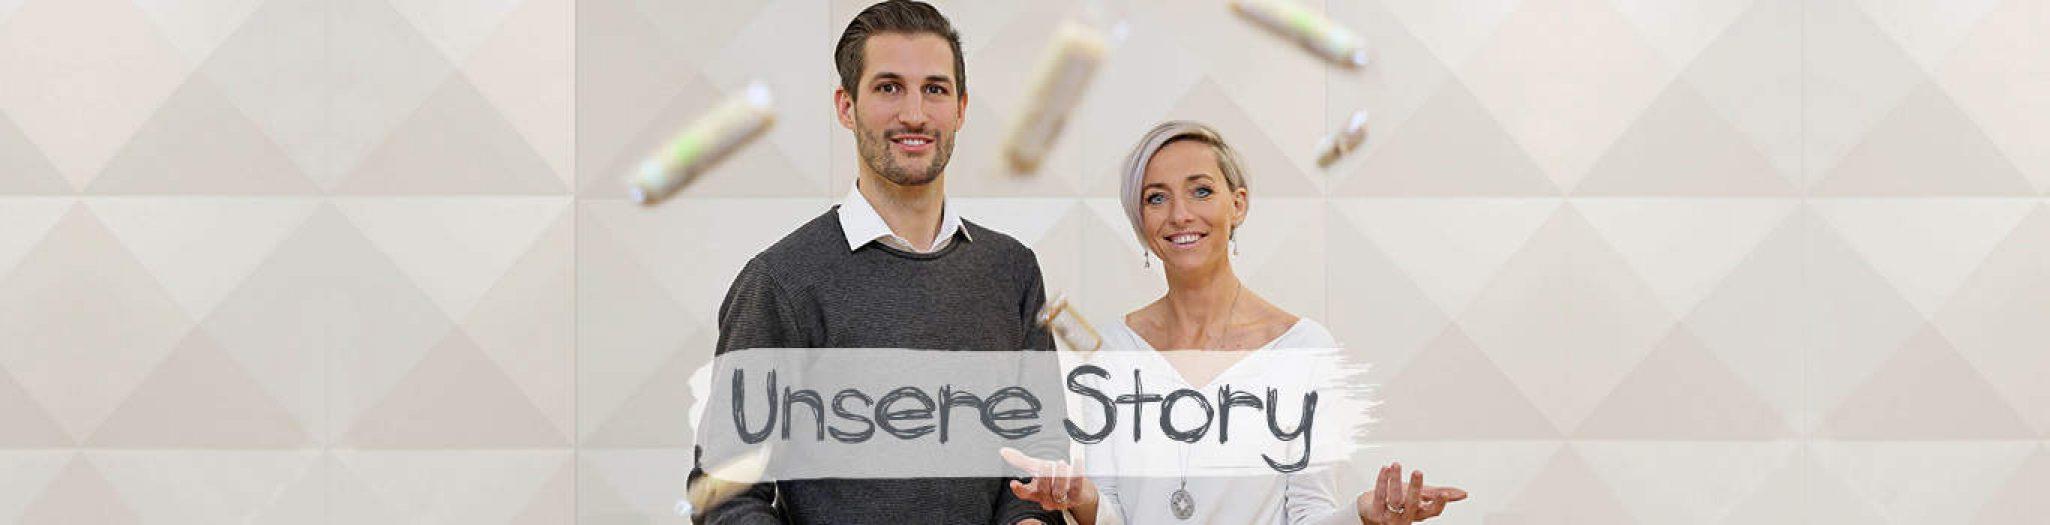 Unsere Story Header